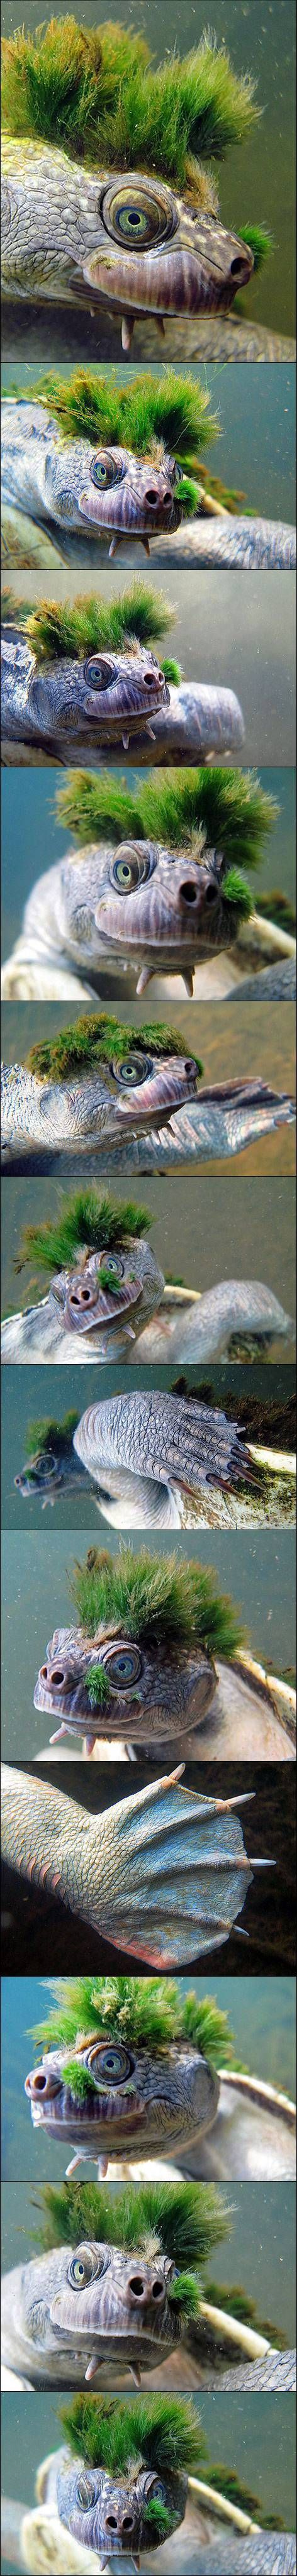 Mary River Turtle. Love.: Mary River Turtle. Love.